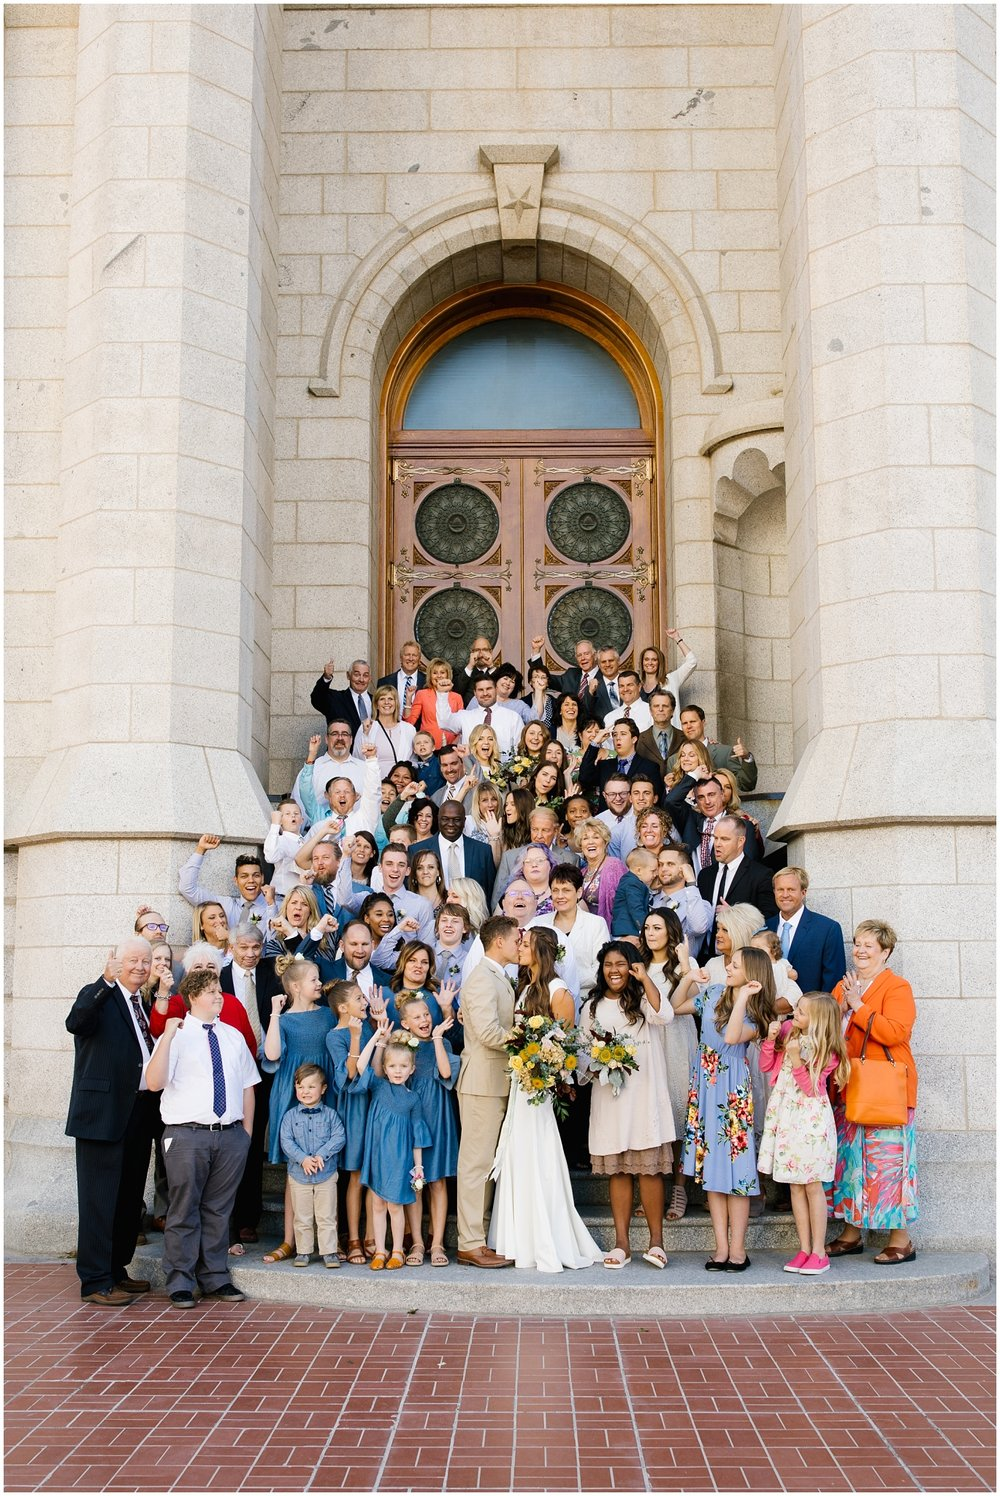 JC-Wedding-76_Lizzie-B-Imagery-Utah-Wedding-Photographer-Park-City-Salt-Lake-City-Temple-Joseph-Smith-Memorial-Building-Empire-Room.jpg